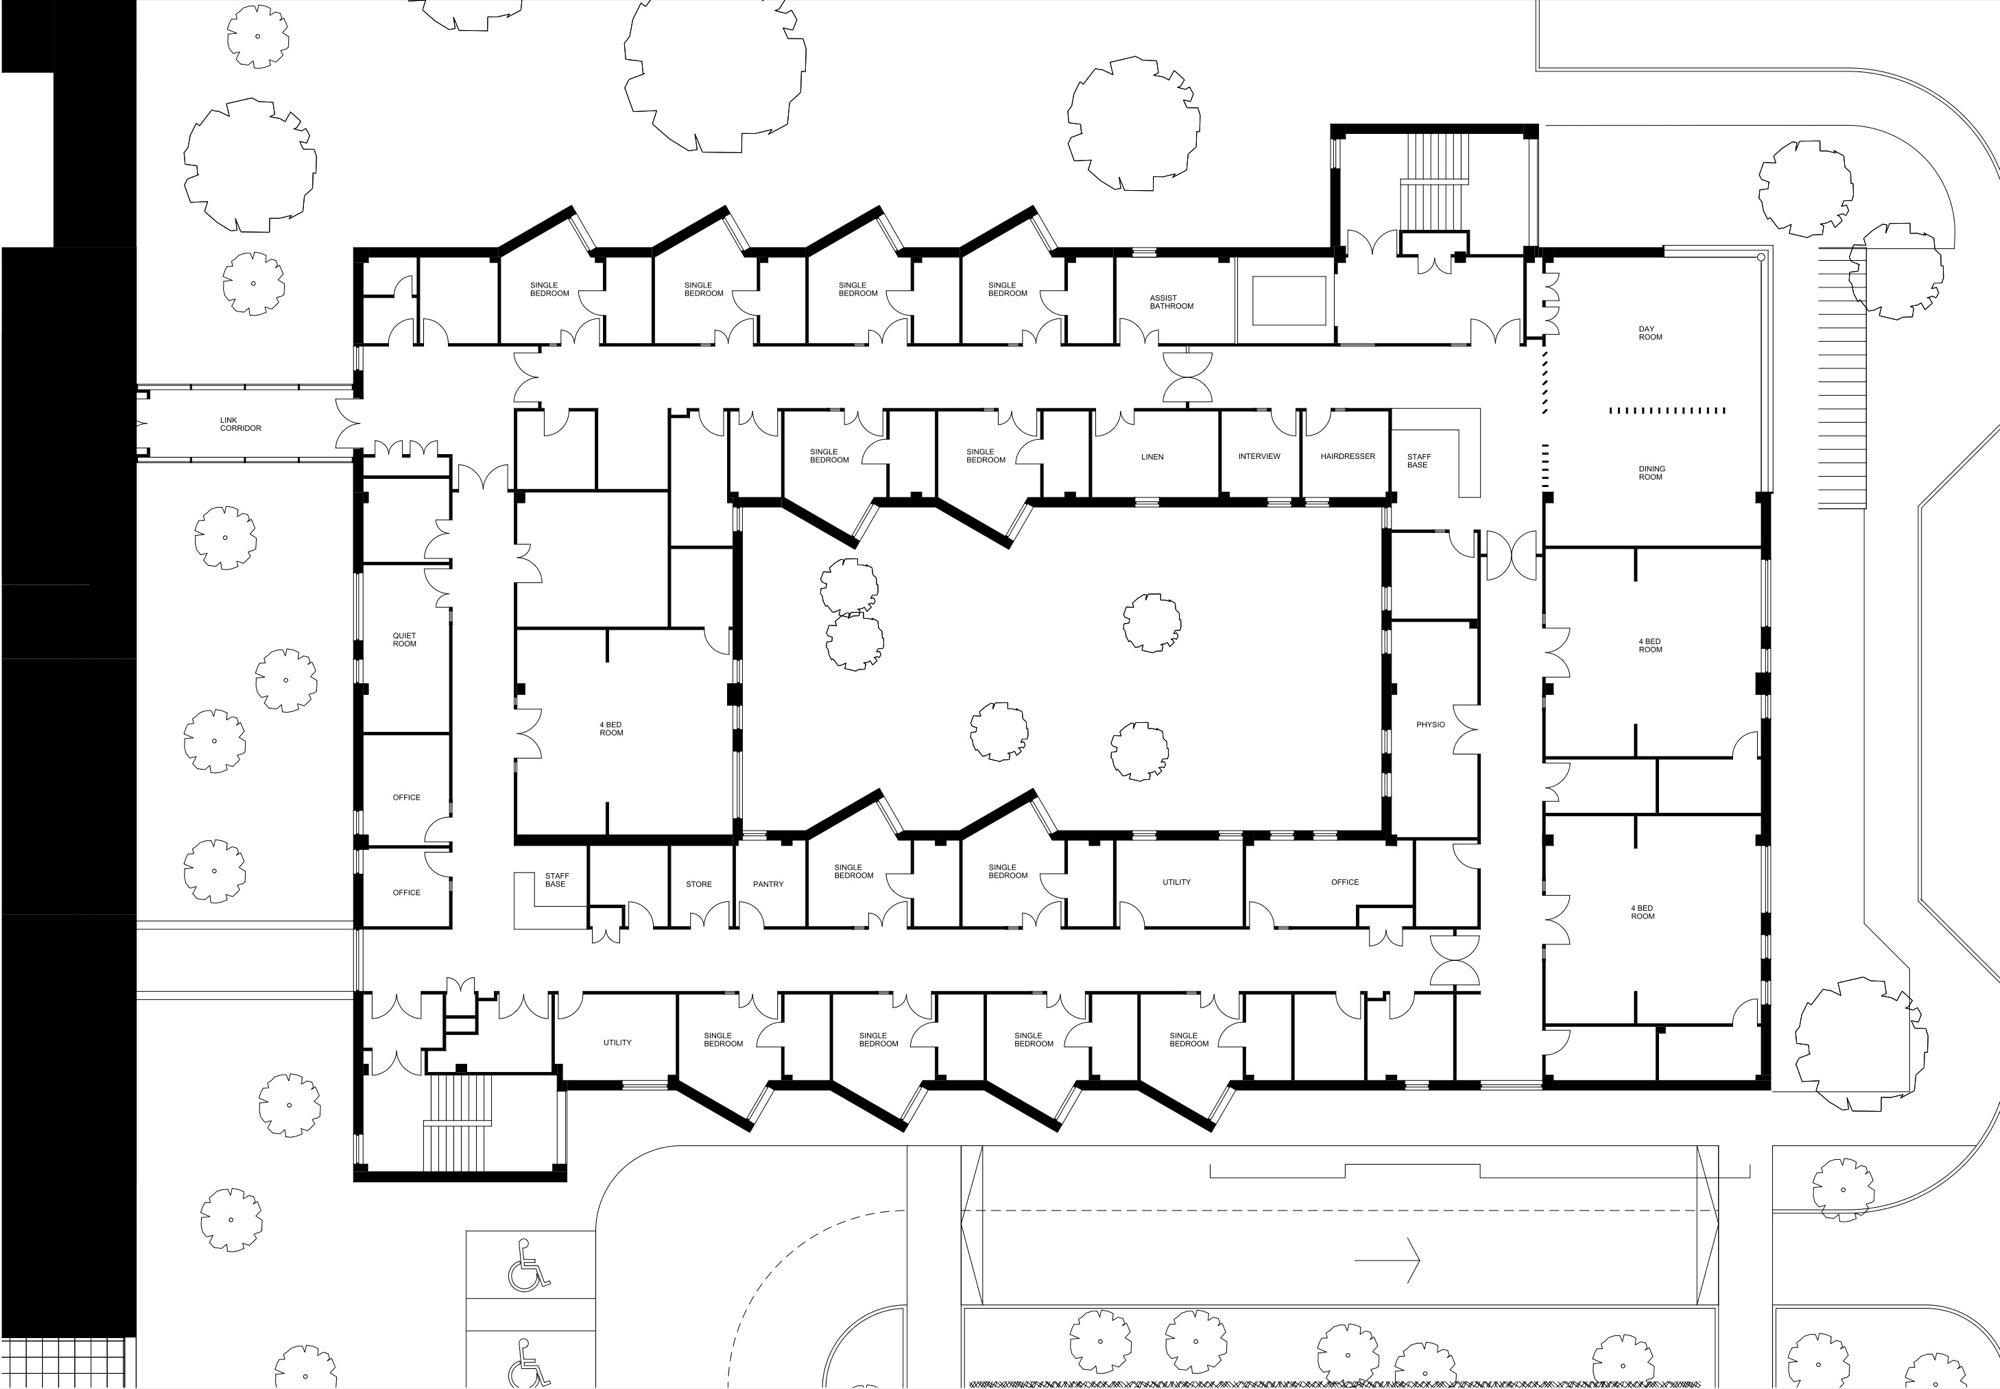 Vet Clinic Floor Plans Architecture Photography Floor Plan 188681